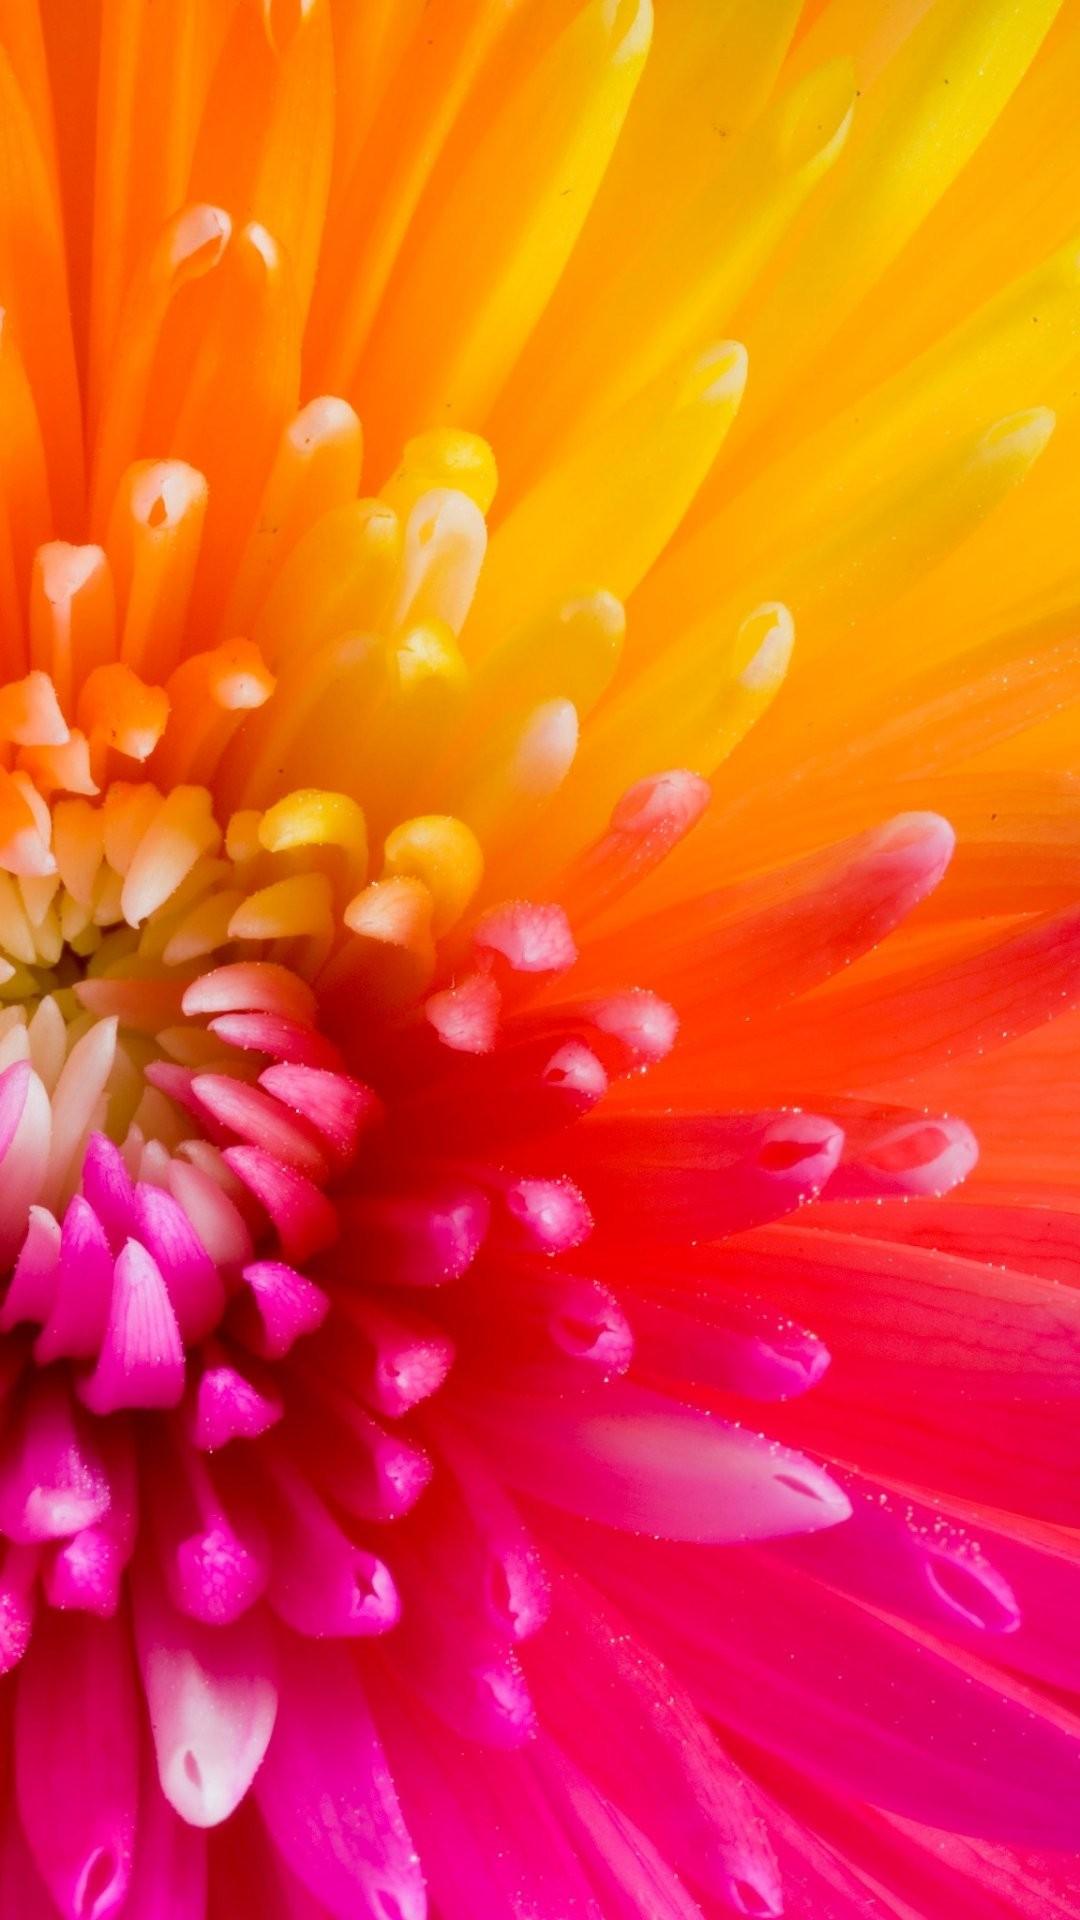 Apple Iphone 6 Flower Wallpaper Hd Flowers Healthy